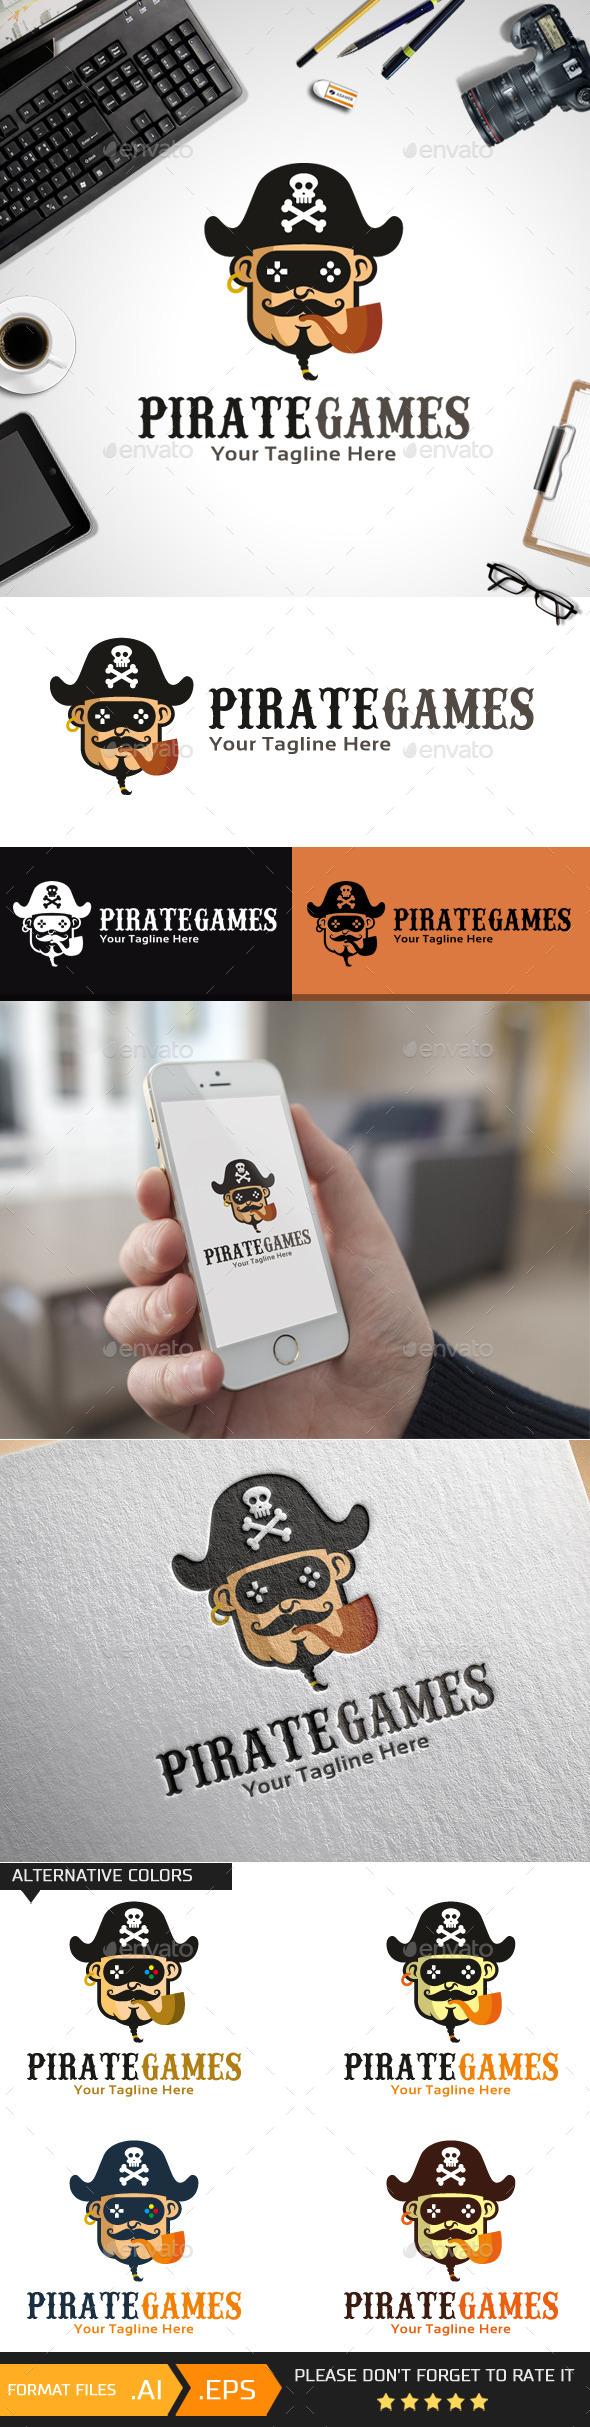 Pirate Games Logo Template